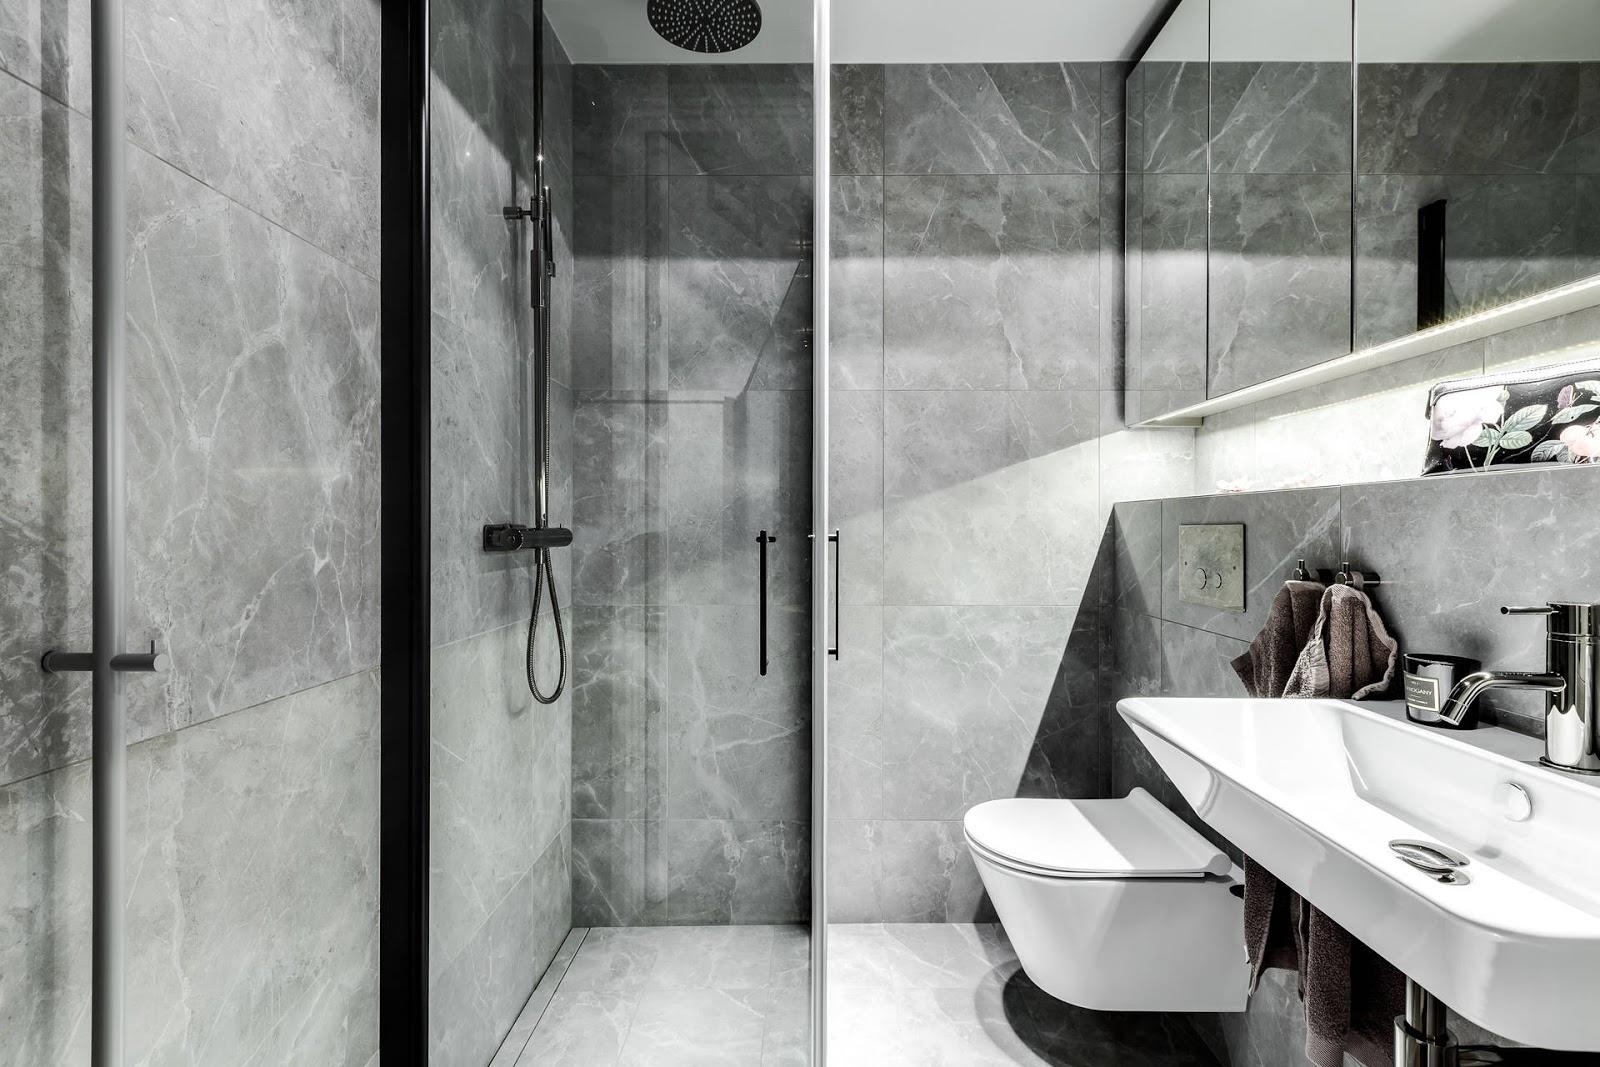 Mooie kleine badkamer met donkere marmeren tegels